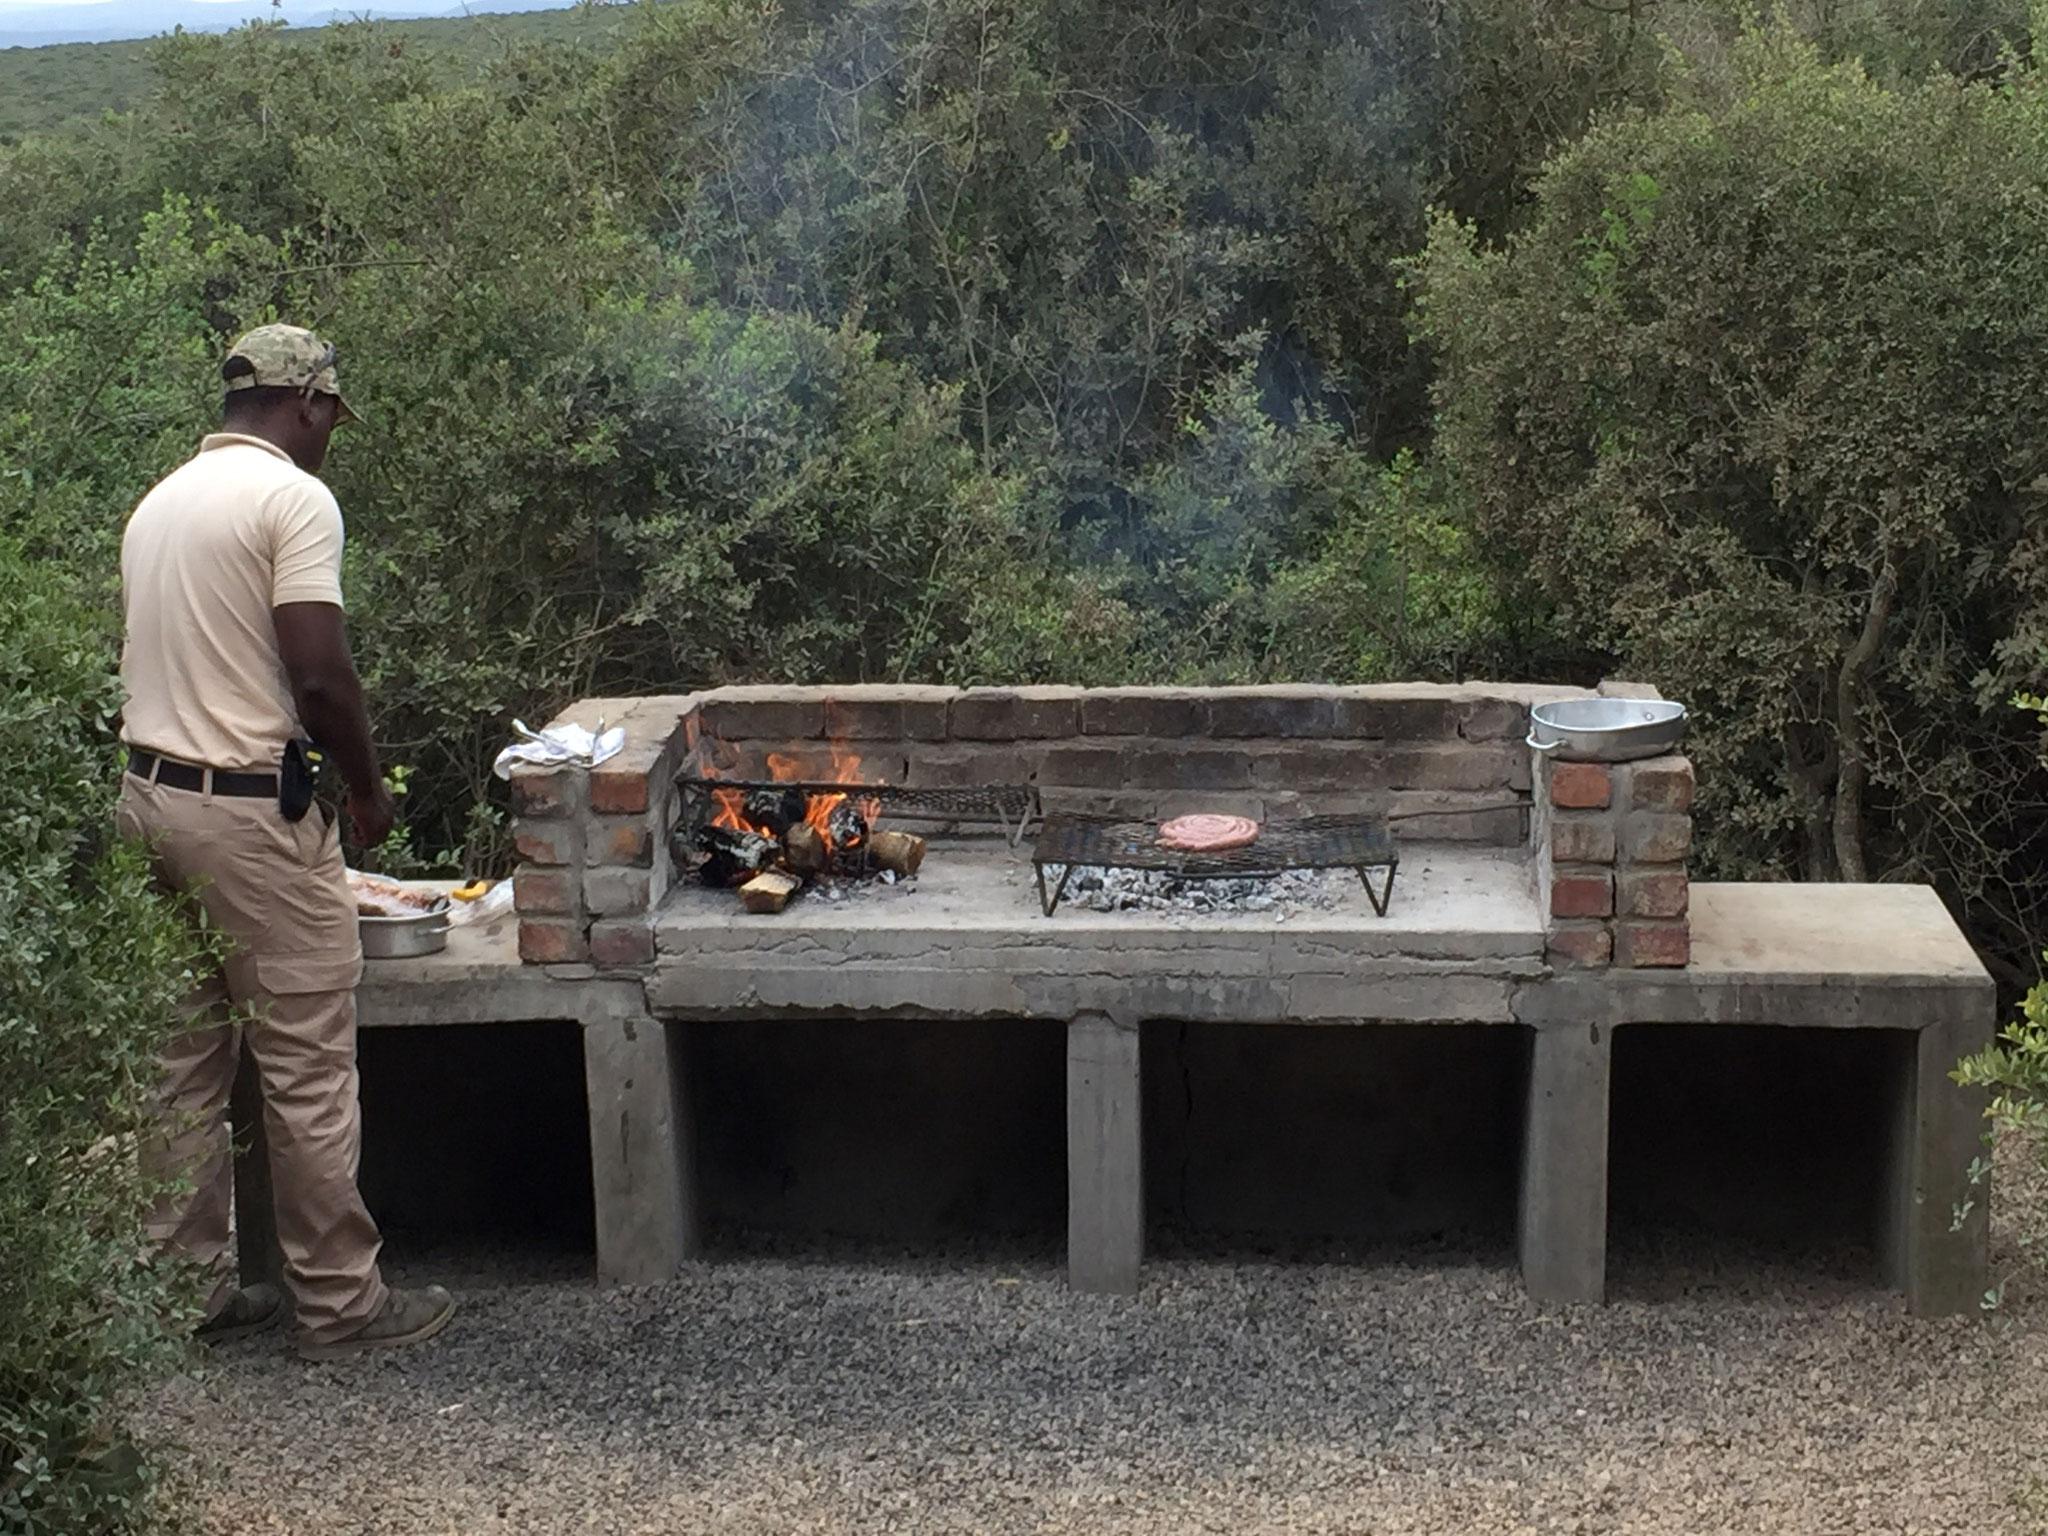 BBQ nennt man in Südafrika Braai